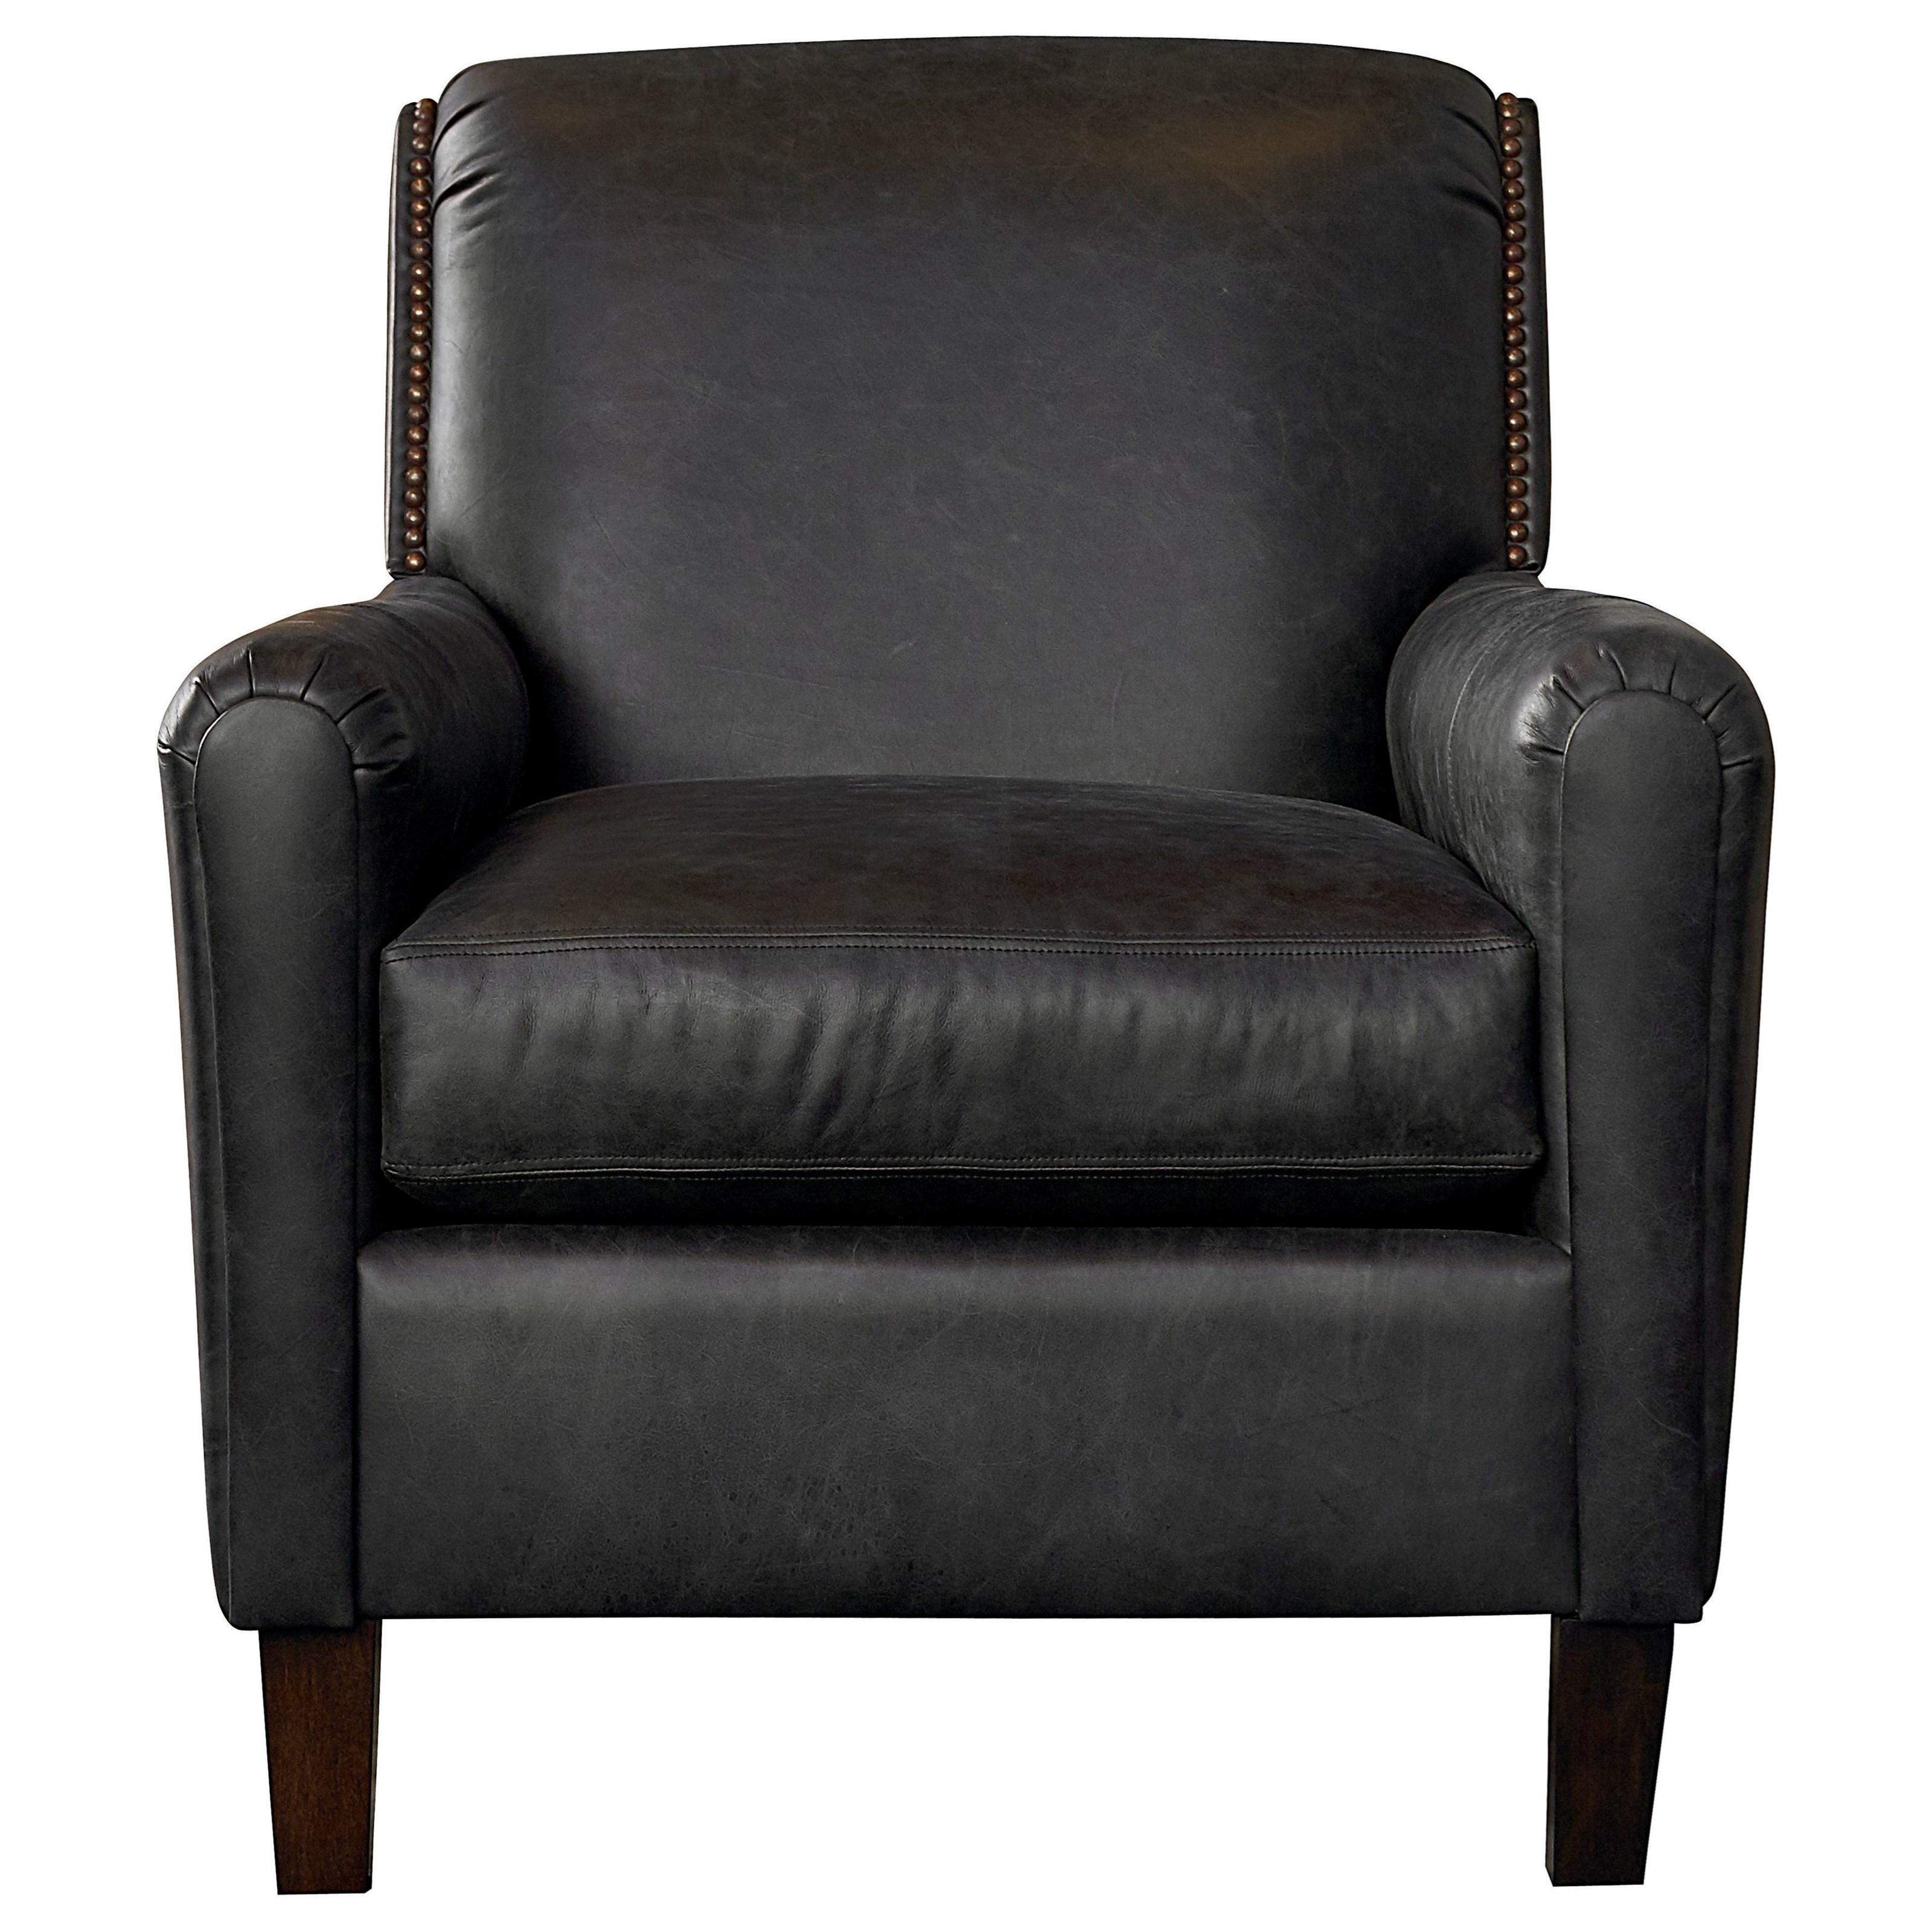 Ridgebury Accent Chair by Bassett at Williams & Kay